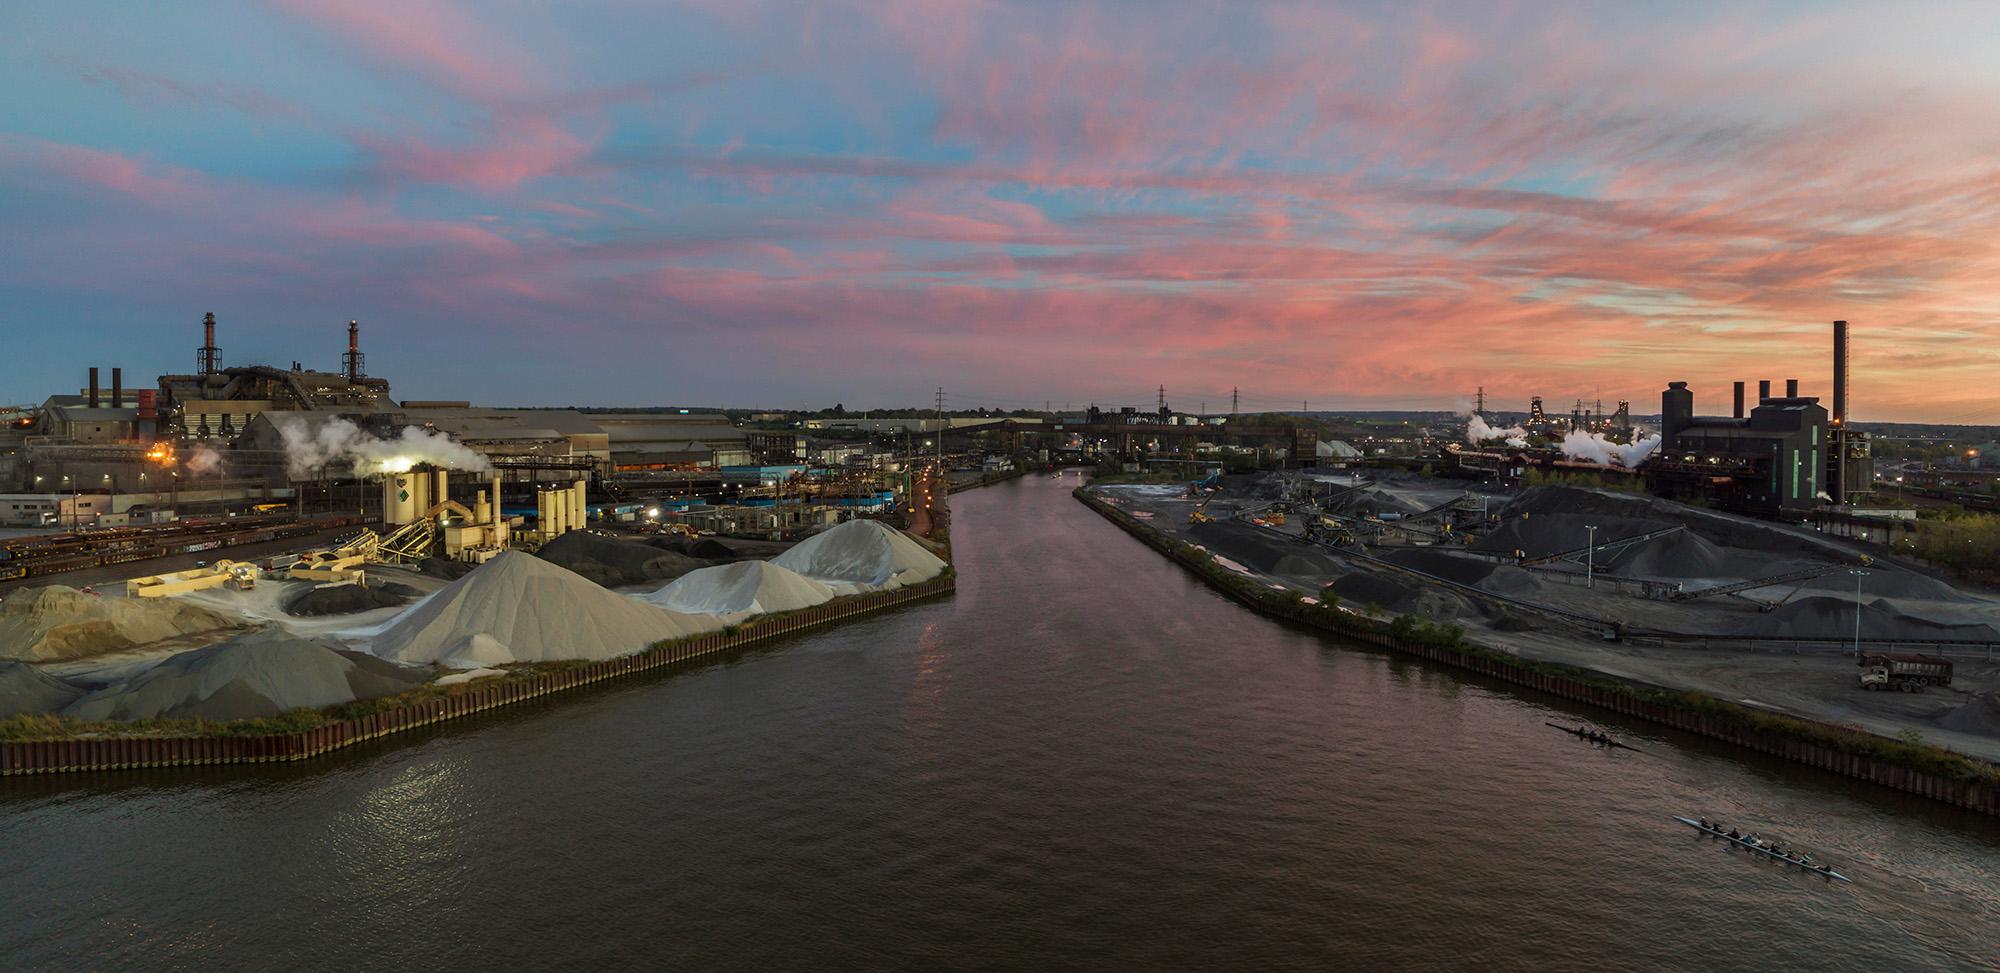 023_Peter_Essick-Rowers_Cuyahoga_River_Ohio.jpg